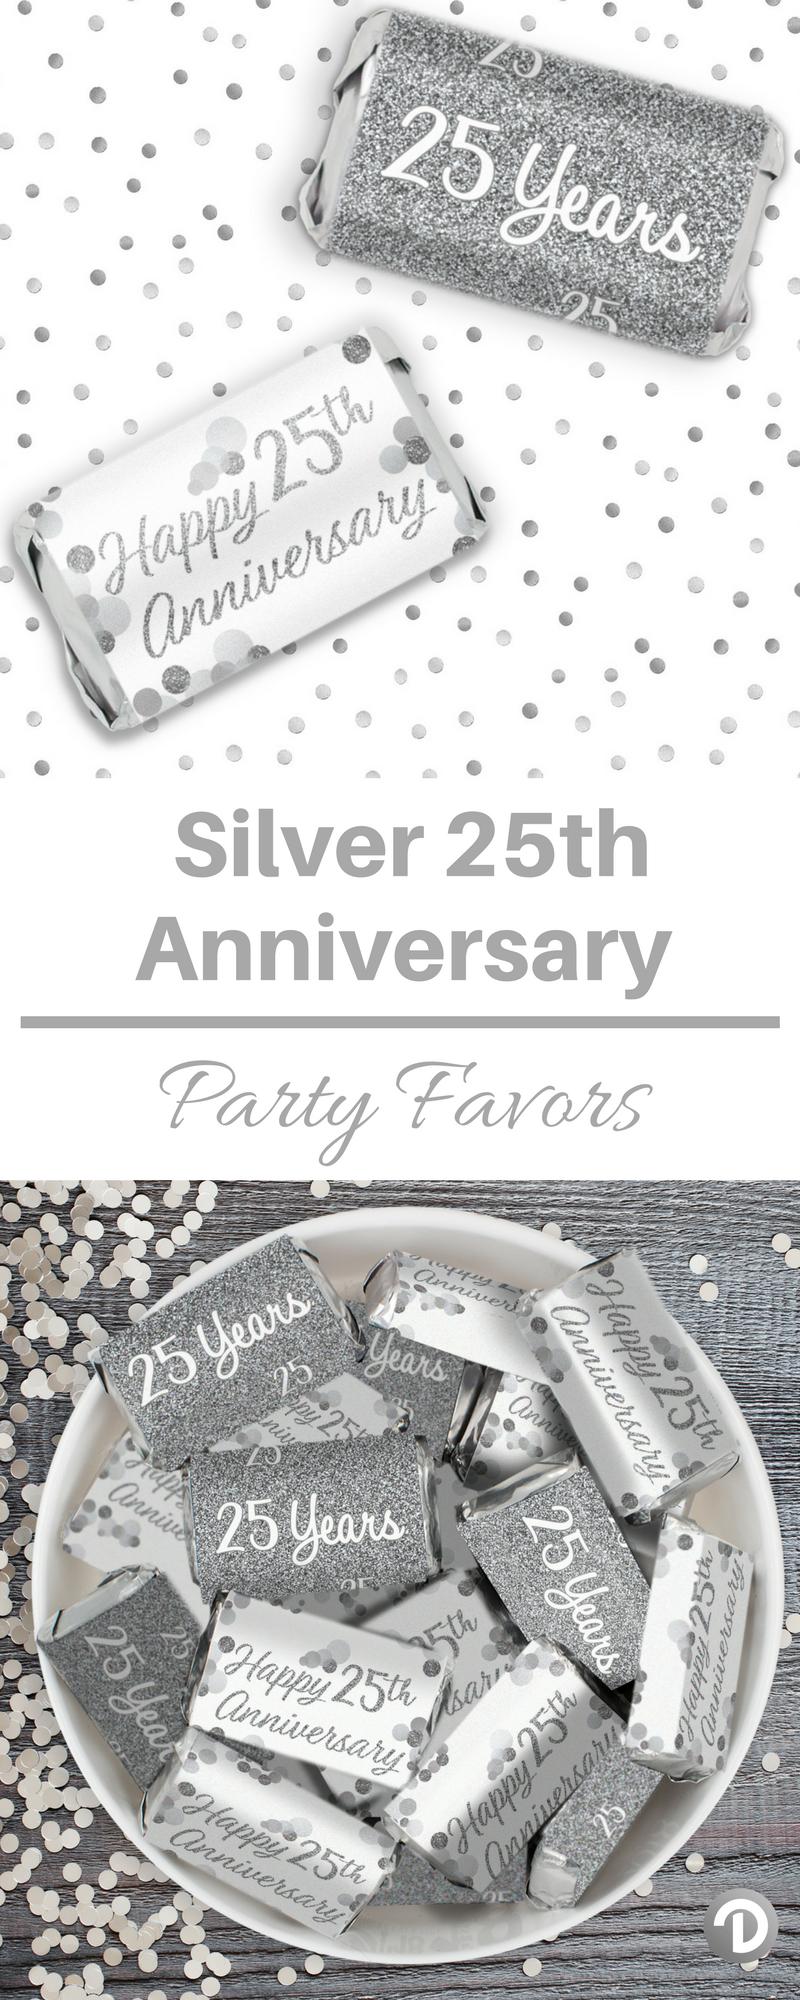 silver 25th anniversary mini candy bar stickers 54 count 25th